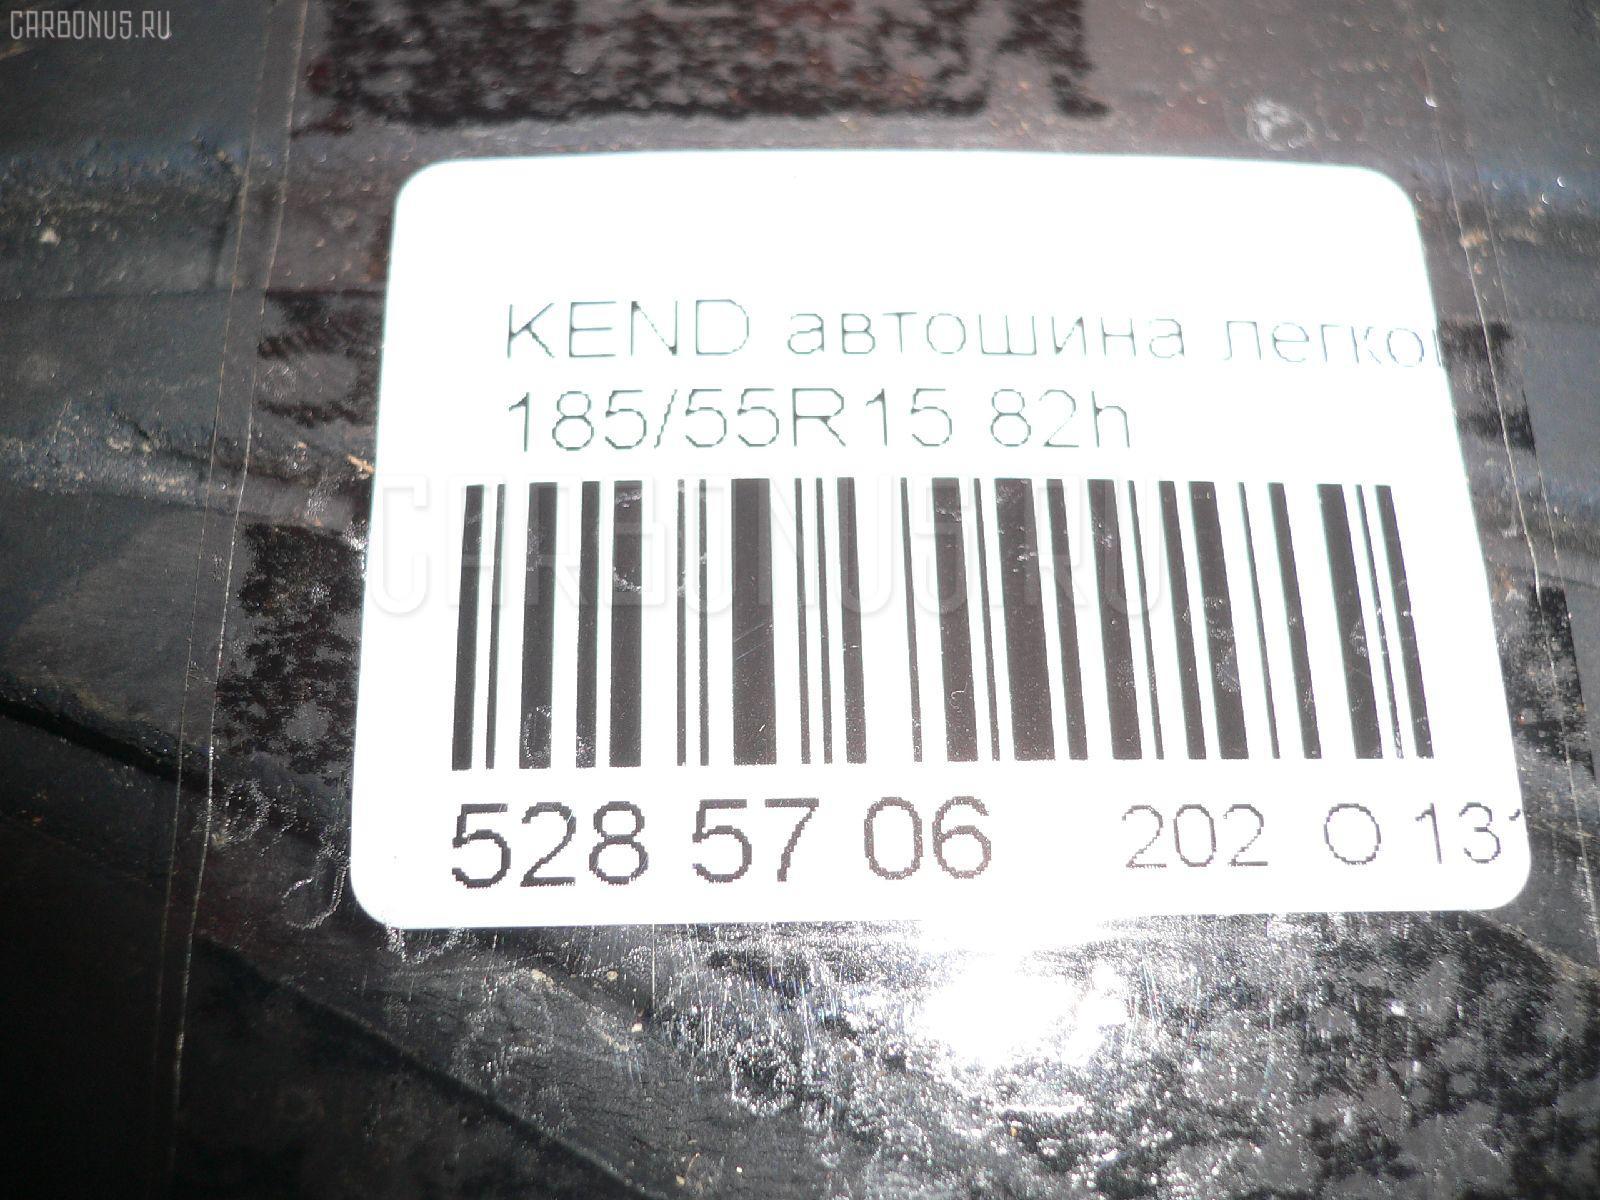 Автошина легковая летняя KENDA RADIAL 185/55R15 KAISER Фото 2